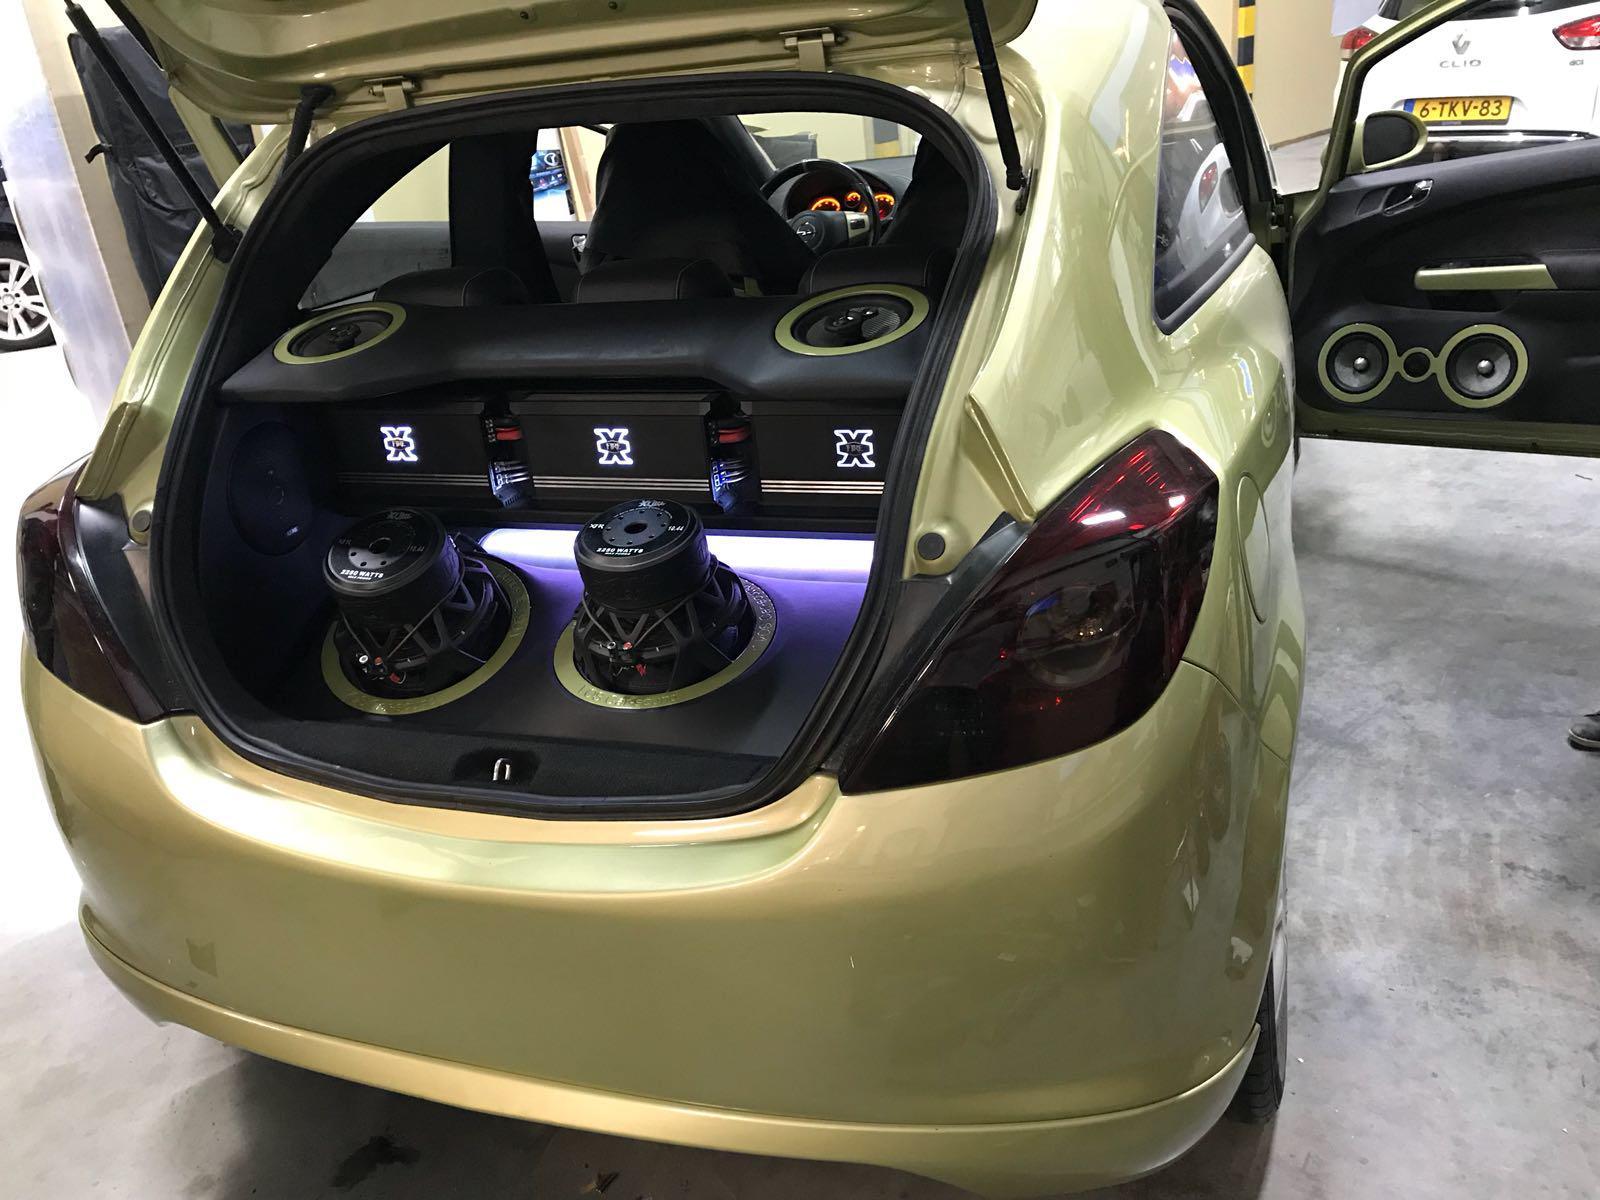 Opel Corsa D - Custom Made audio